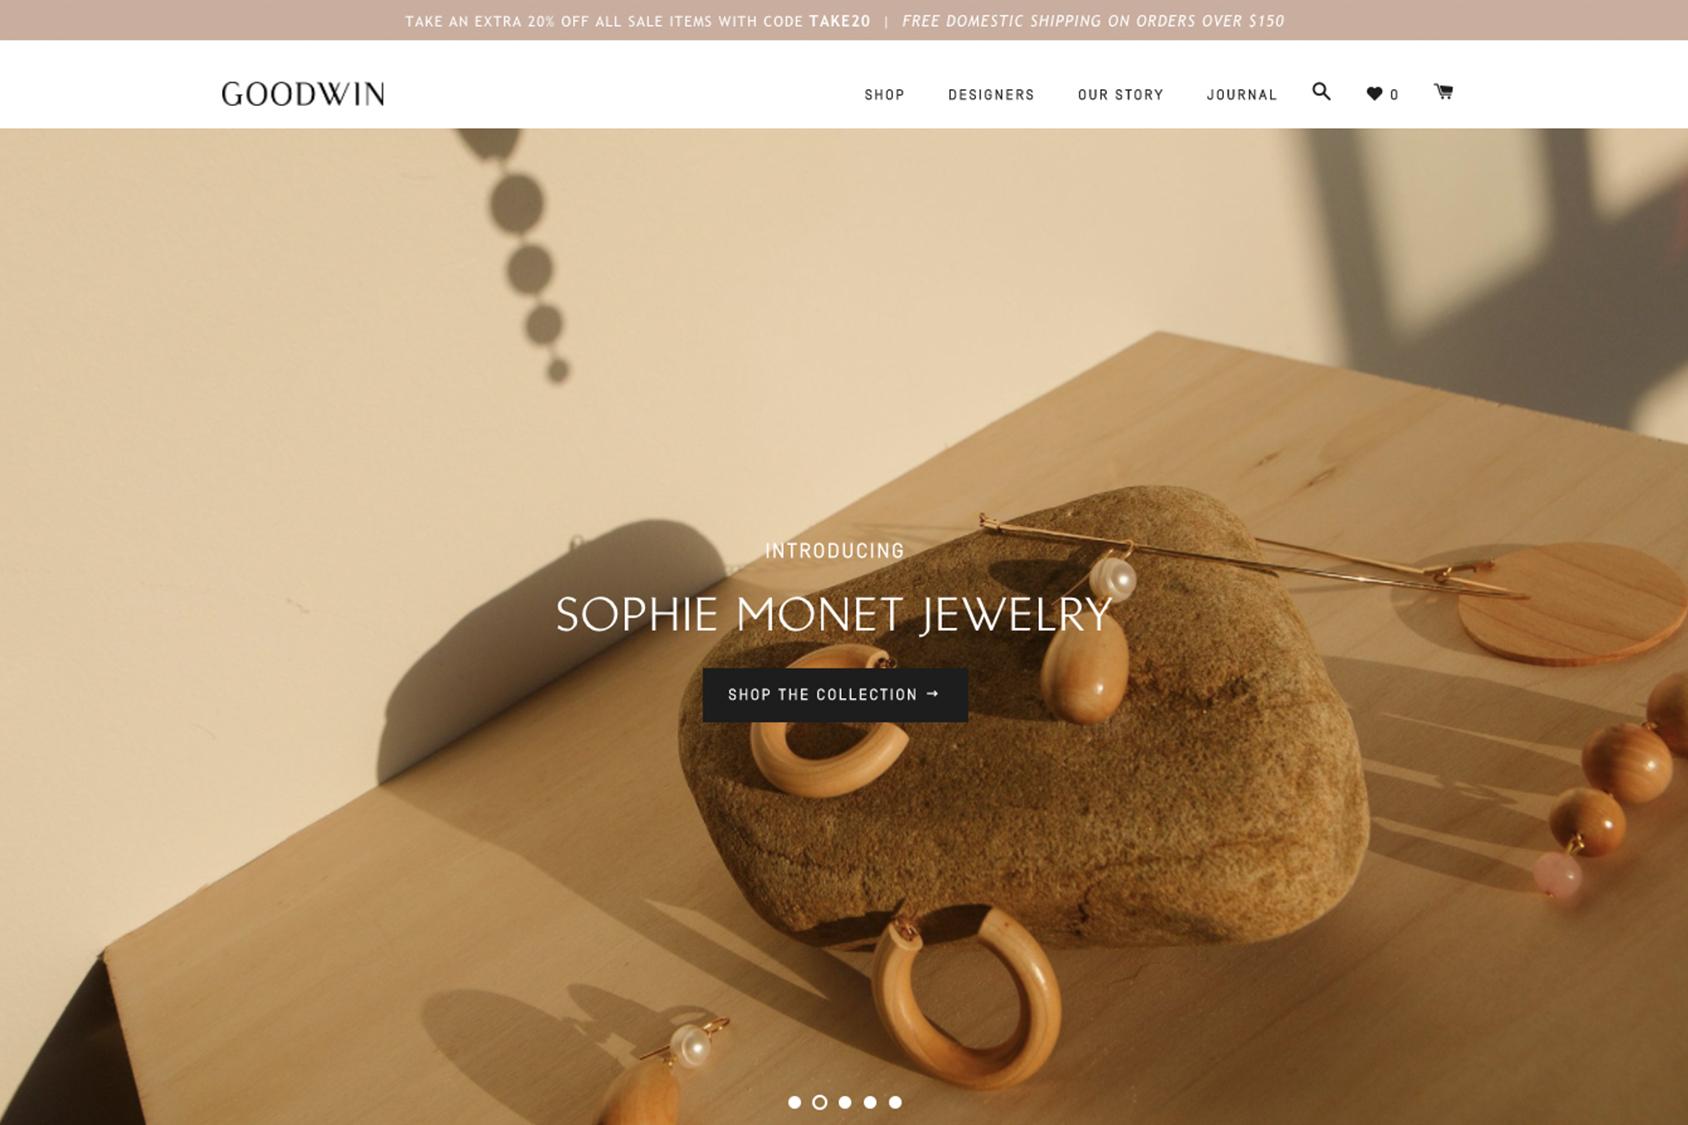 Shopify website by Julia Kostreva Studio